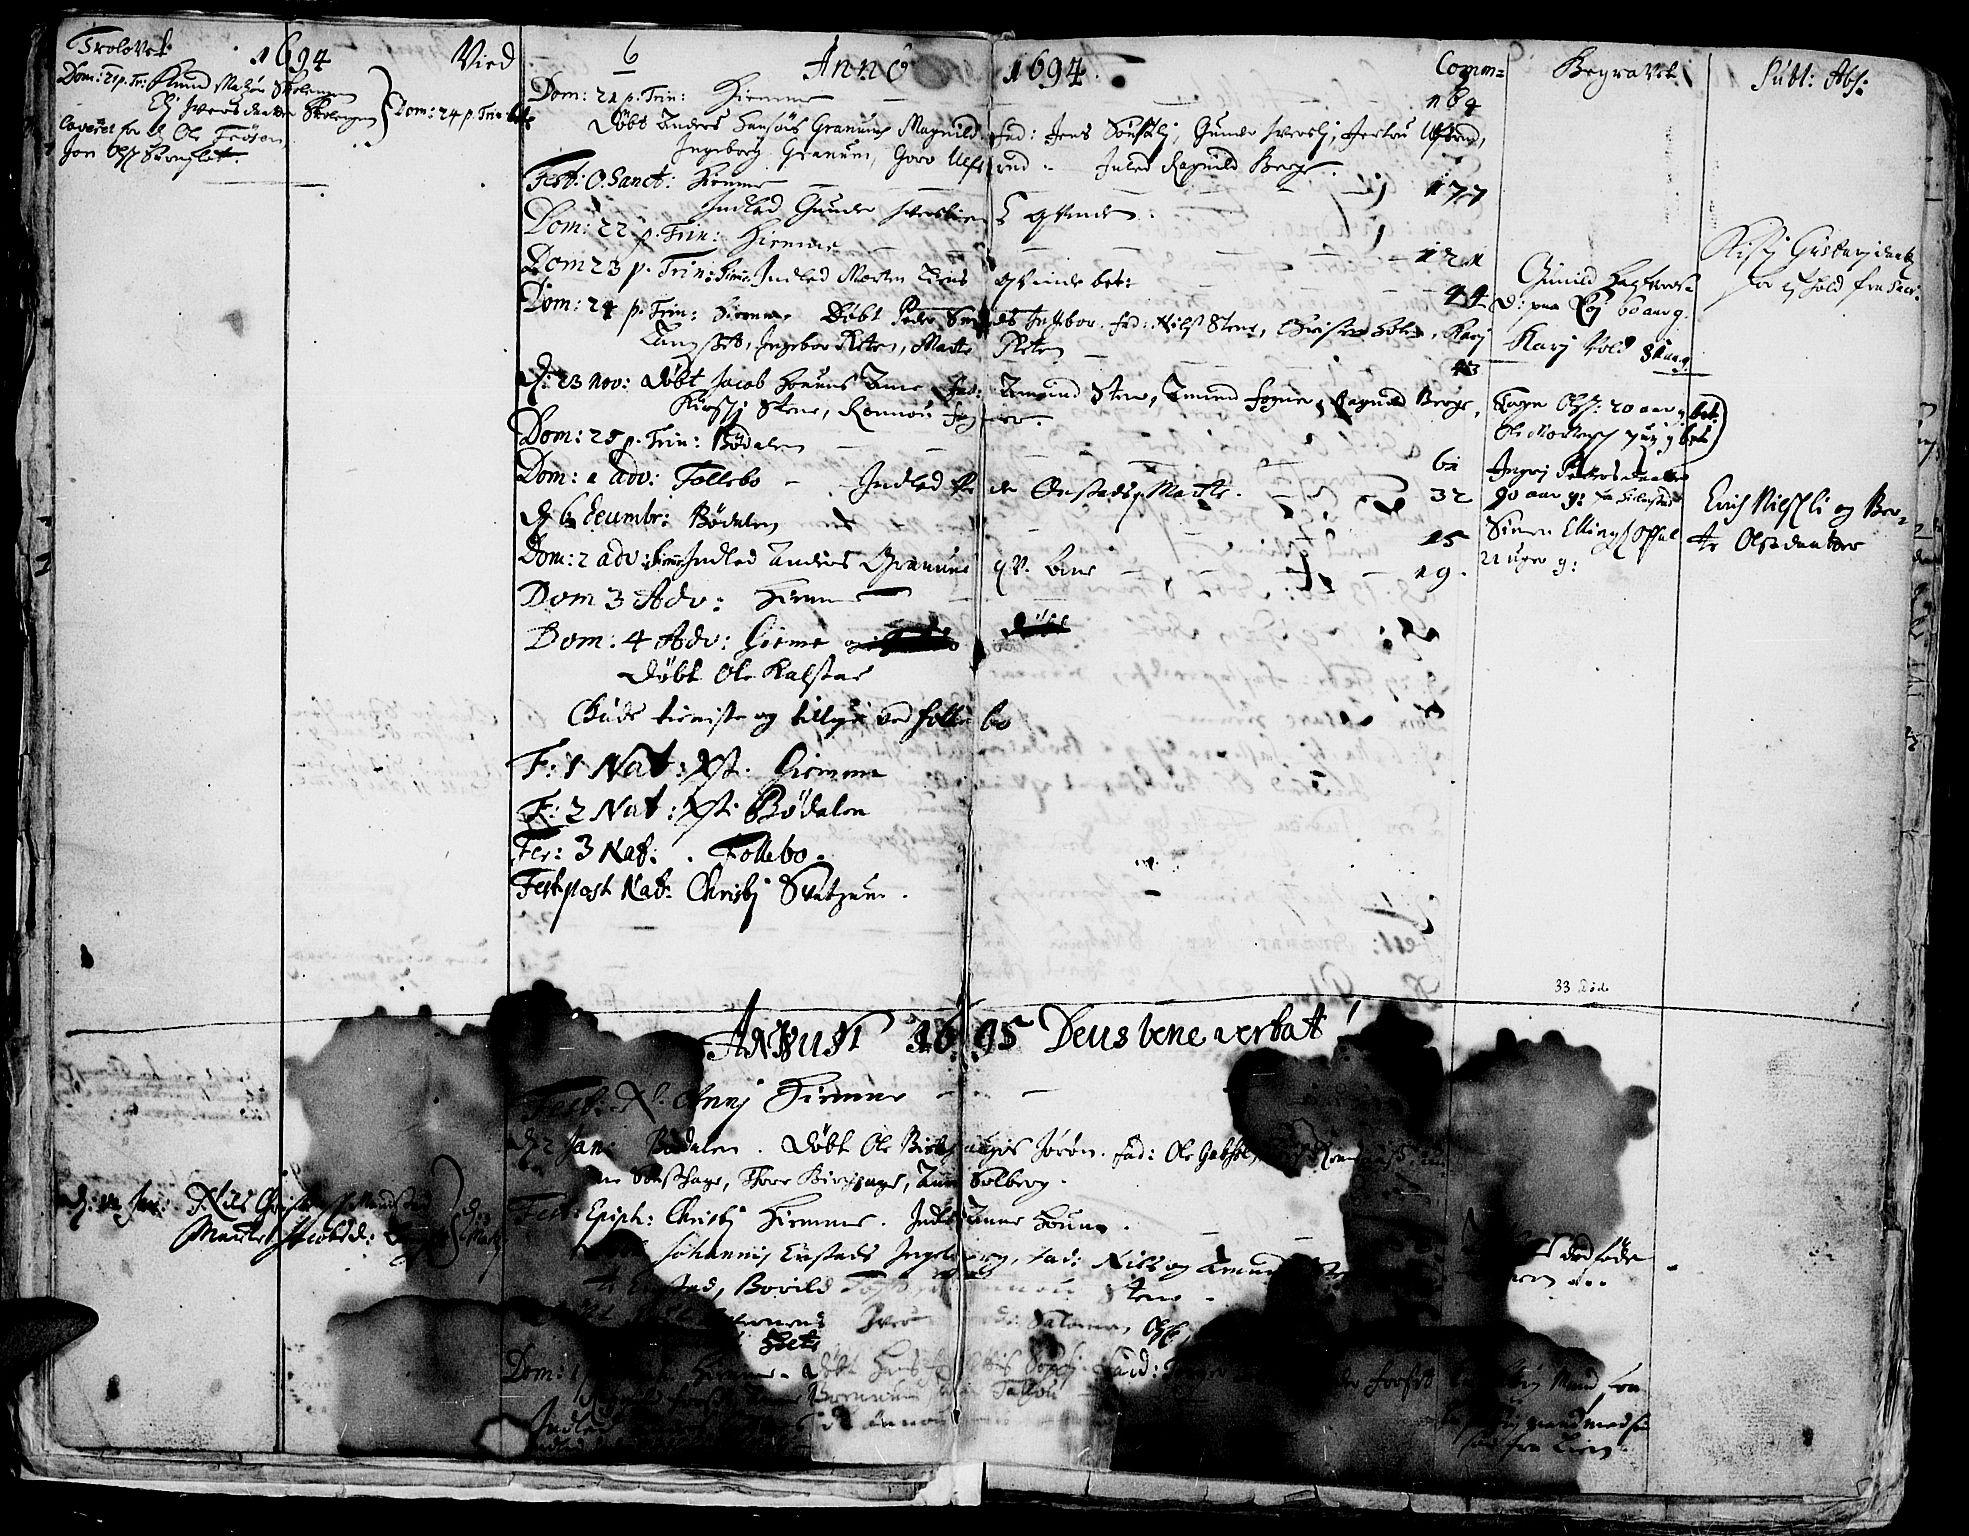 SAH, Gausdal prestekontor, Ministerialbok nr. 1, 1693-1728, s. 6